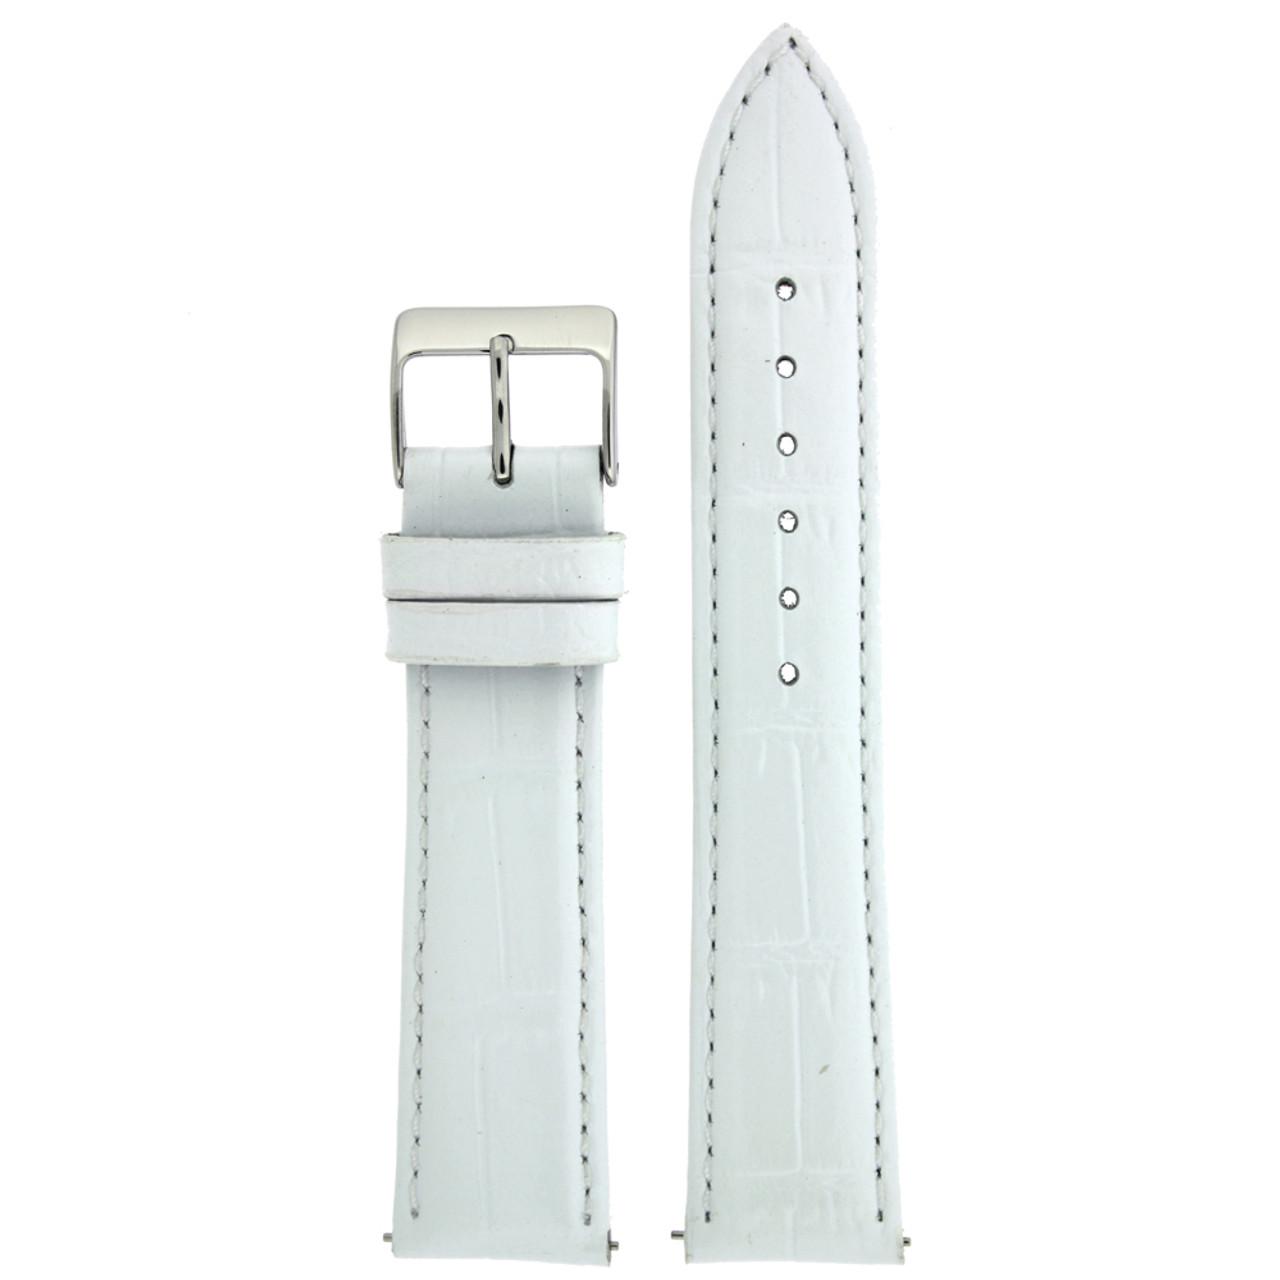 White Crocodile Grain Watch Band - Top View